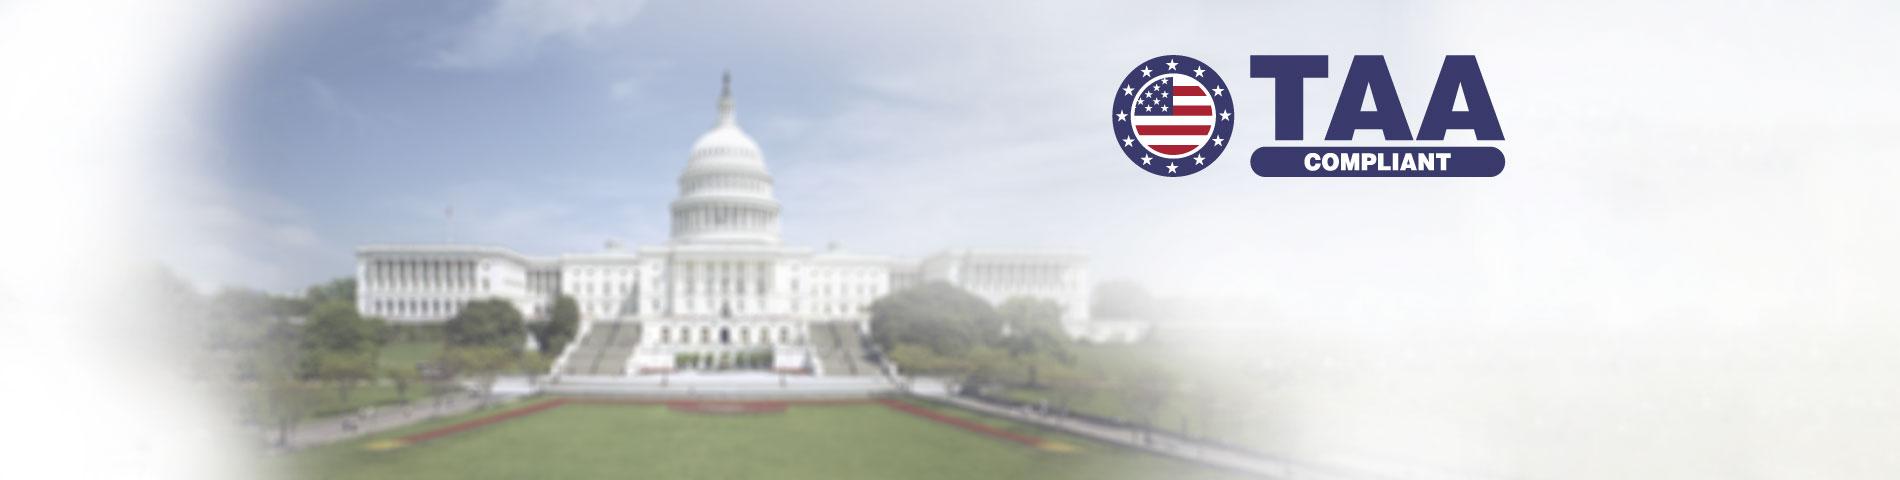 HCI Presents U.S. TAA COMPLIANT SERIES